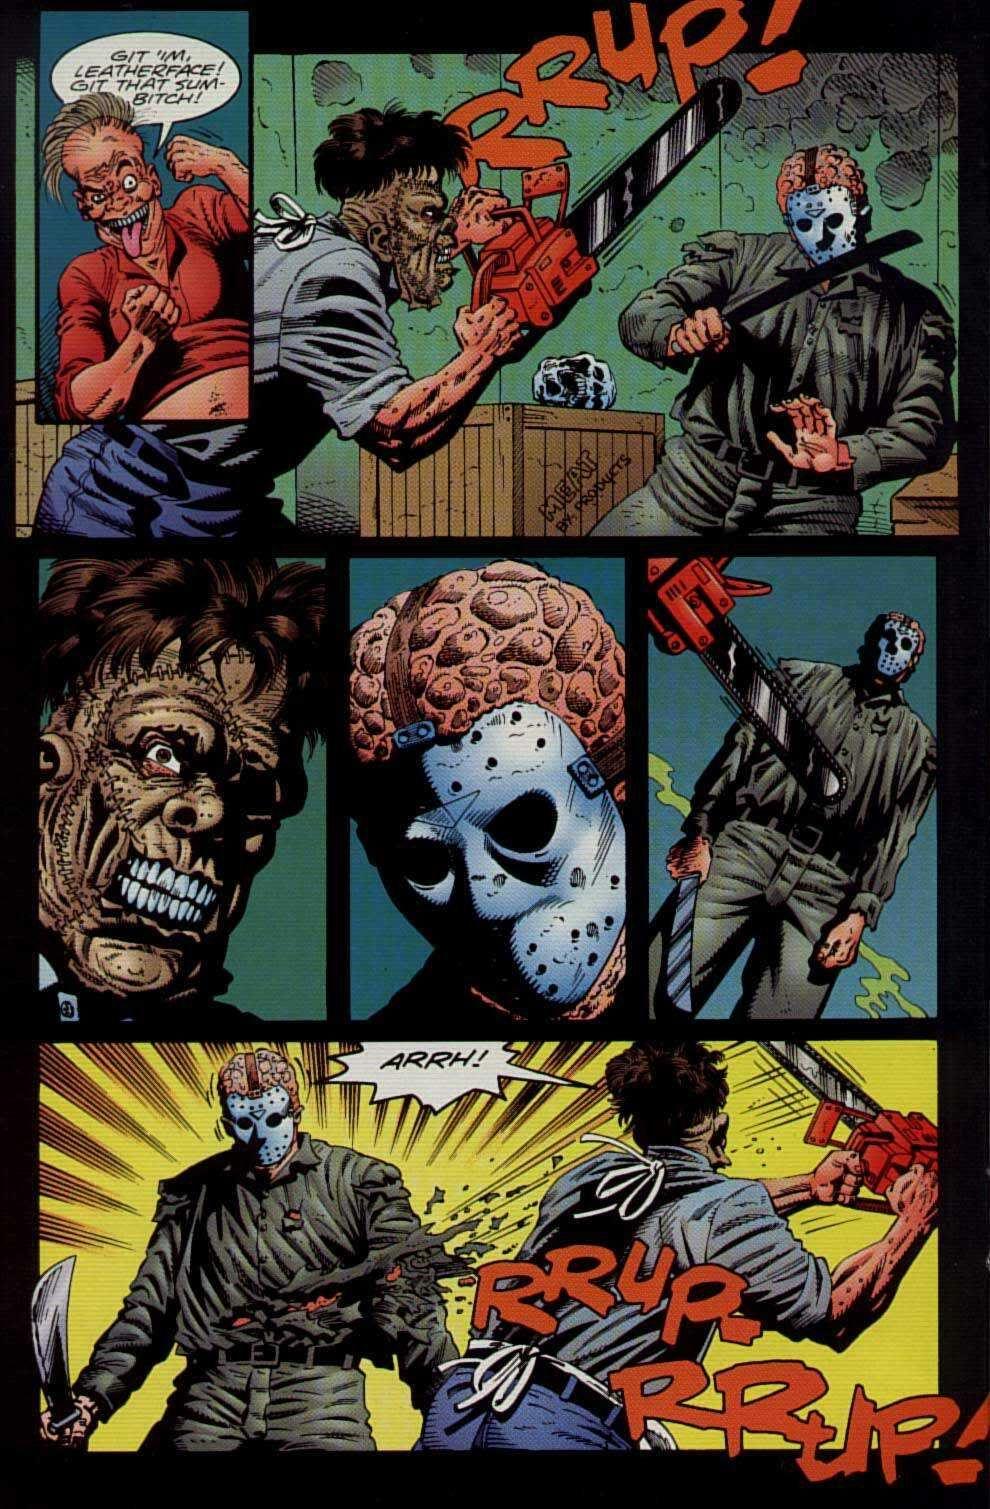 Leatherface vs. Jason